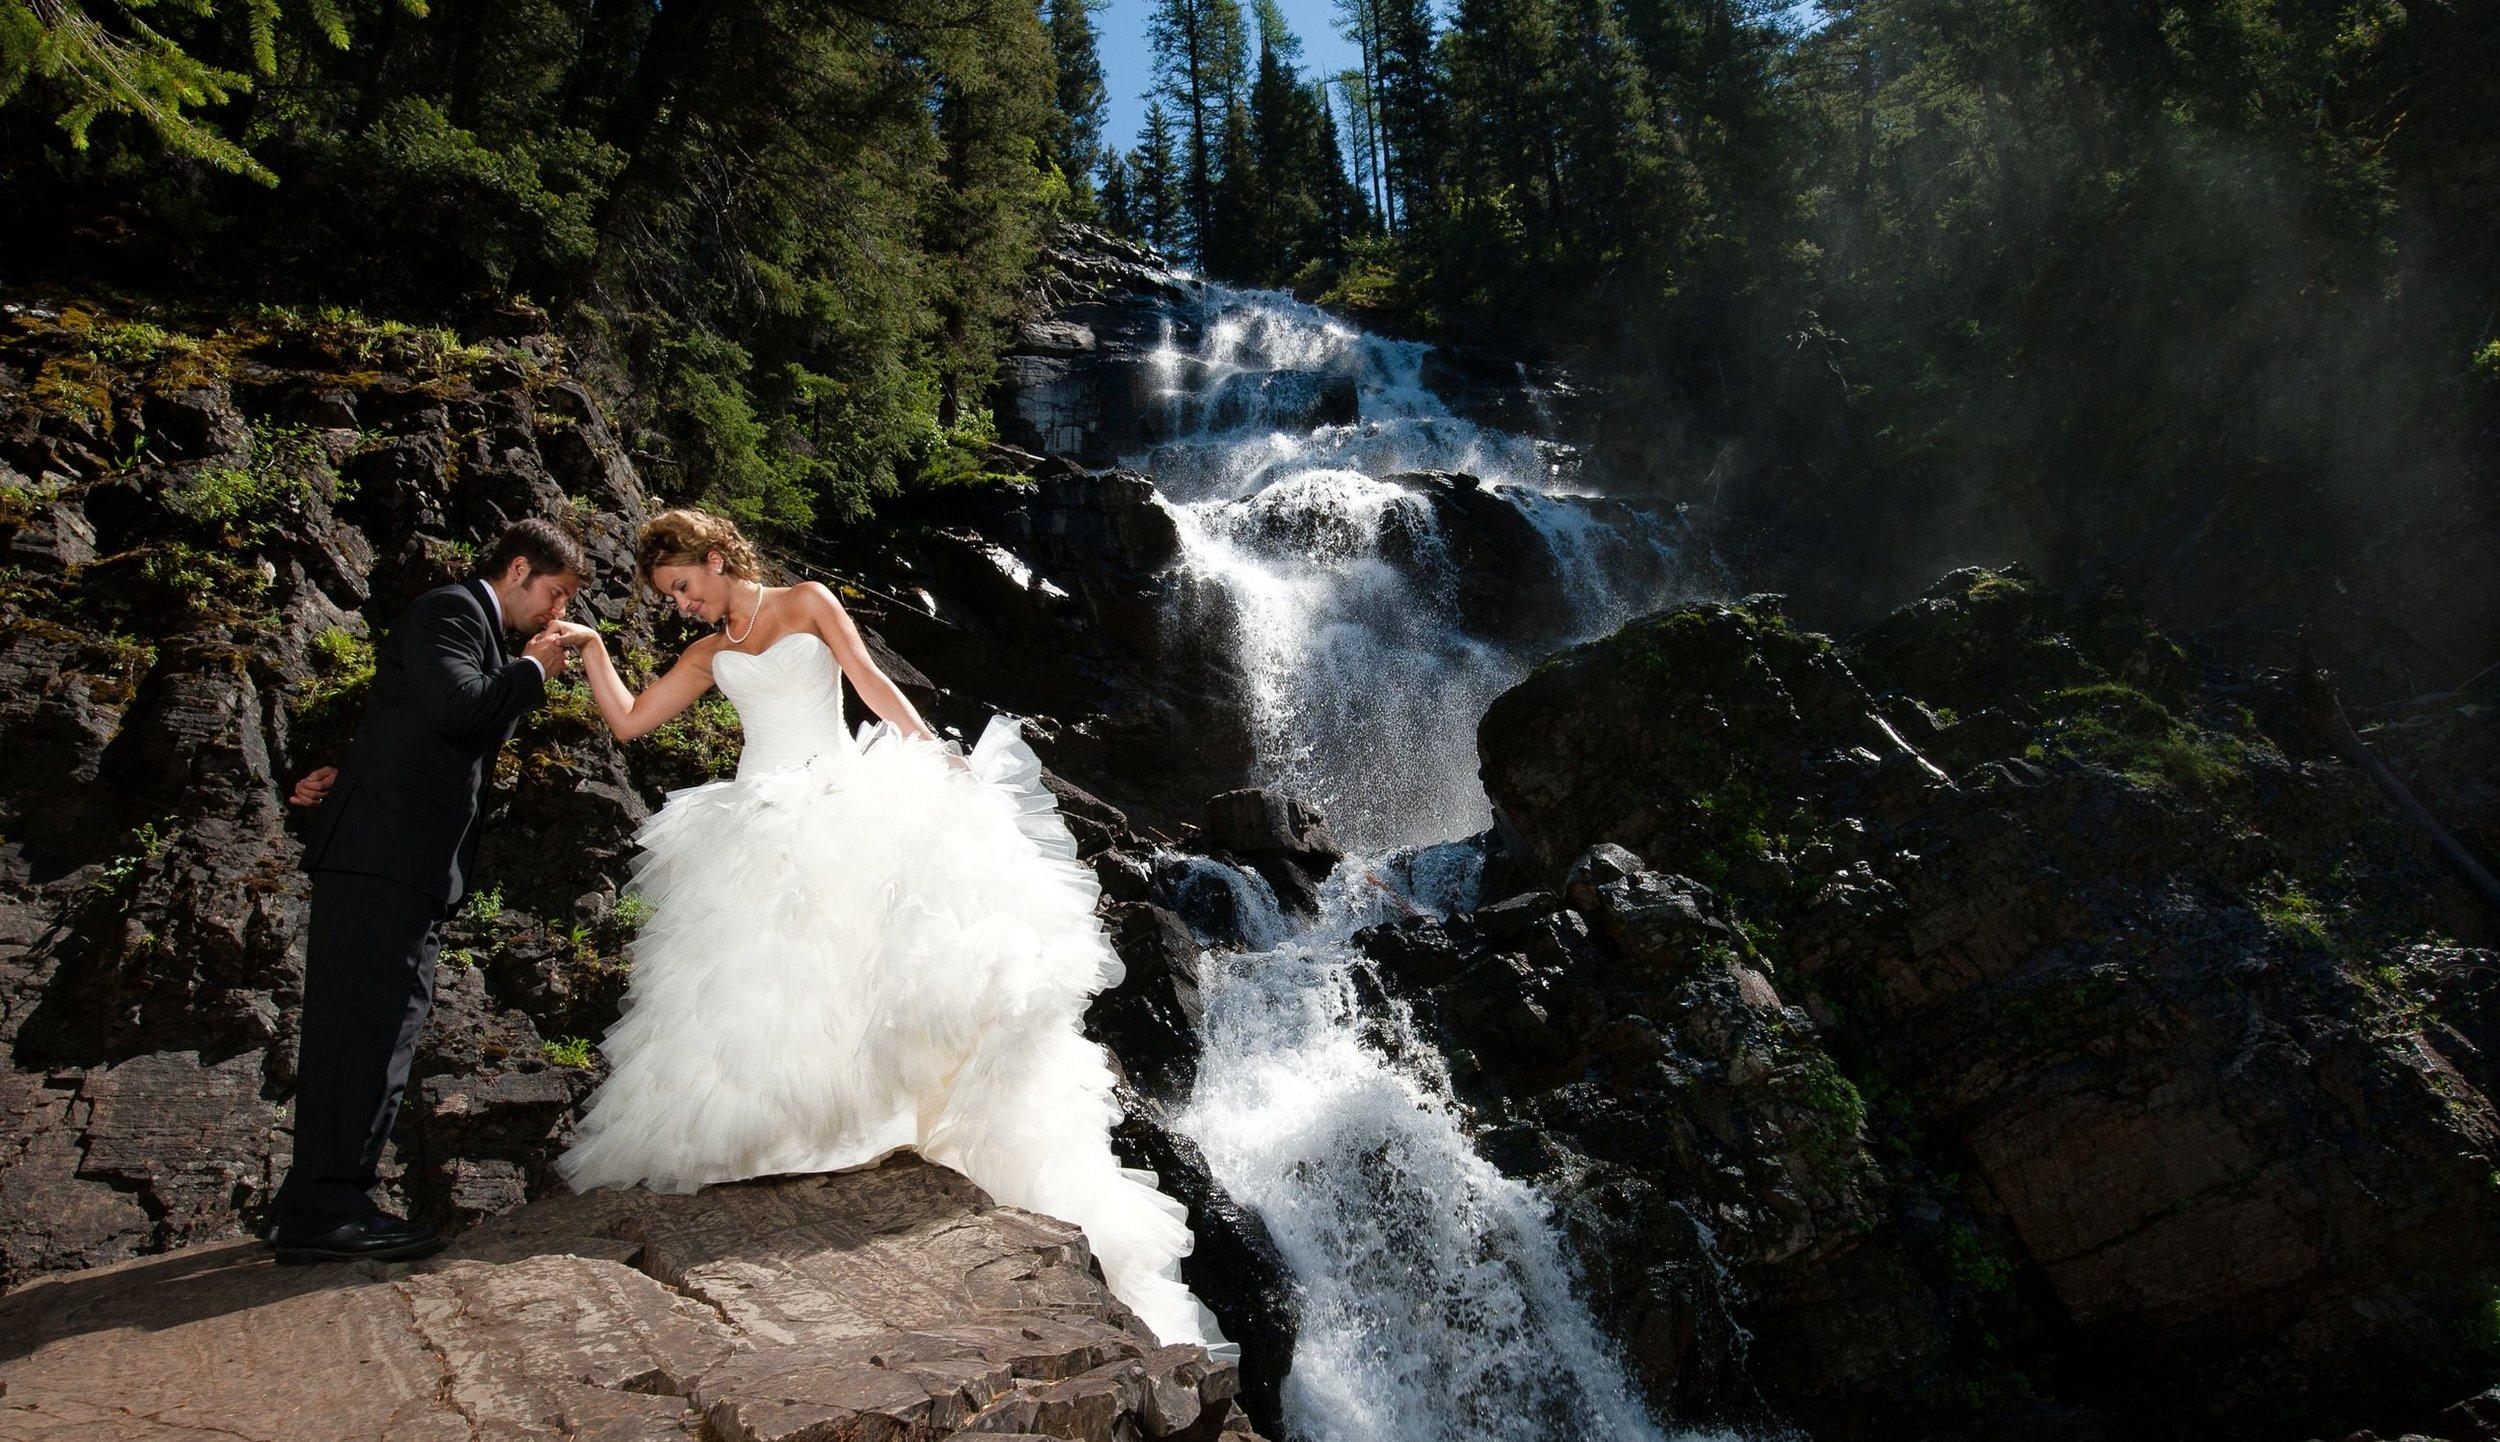 kalispell-wedding-photographer-untitled-6010-edit-1053.jpg